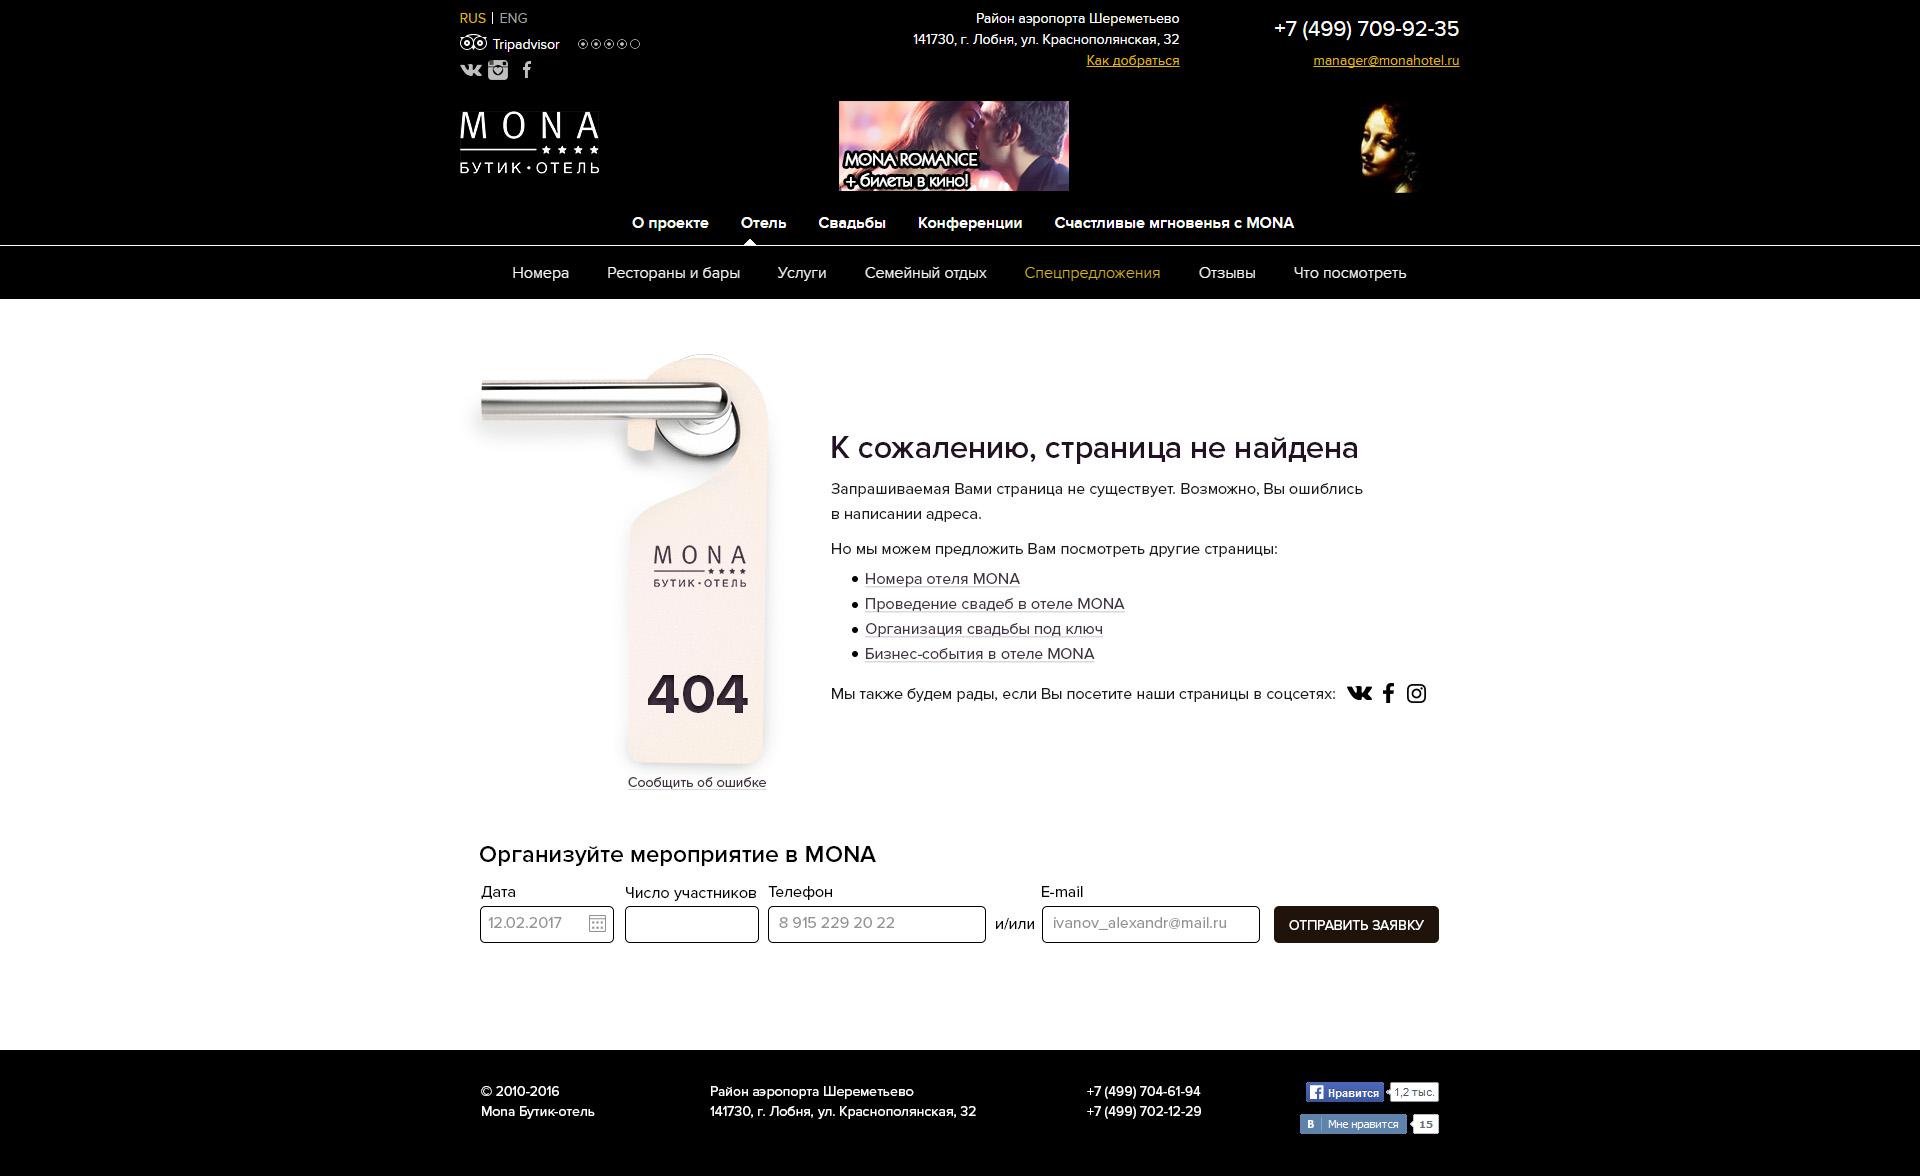 monahotel.ru